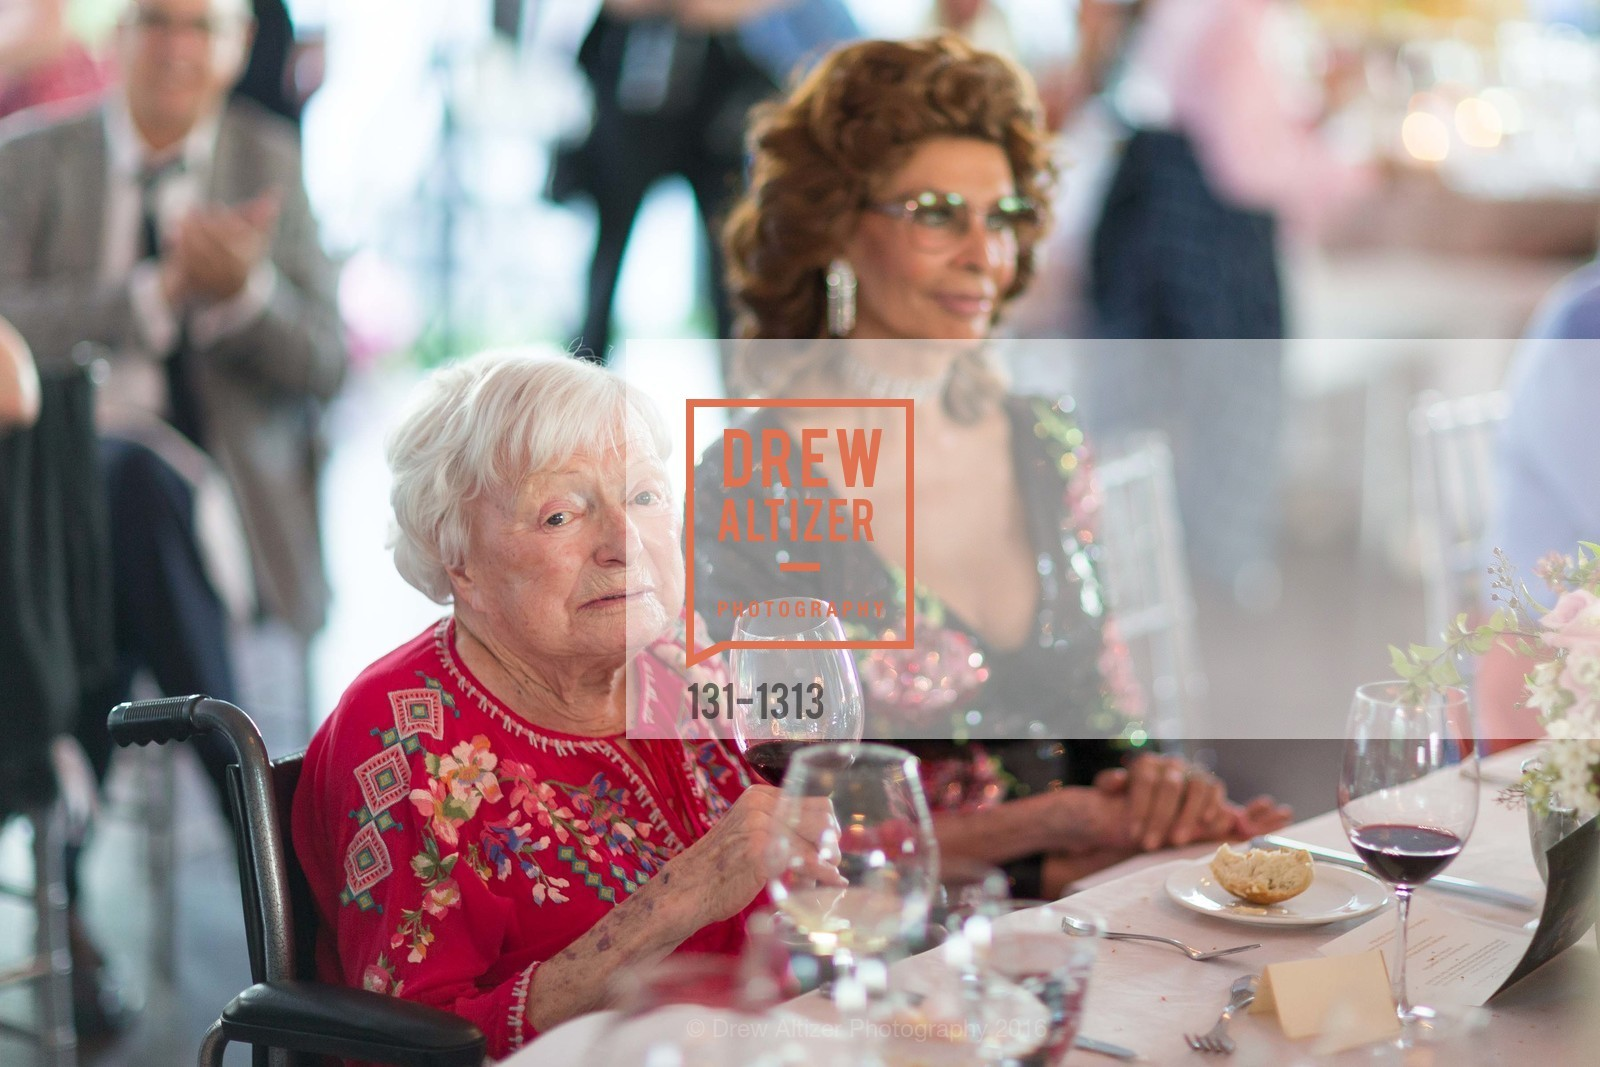 Margrit Mondavi, Sophia Loren, Photo #131-1313